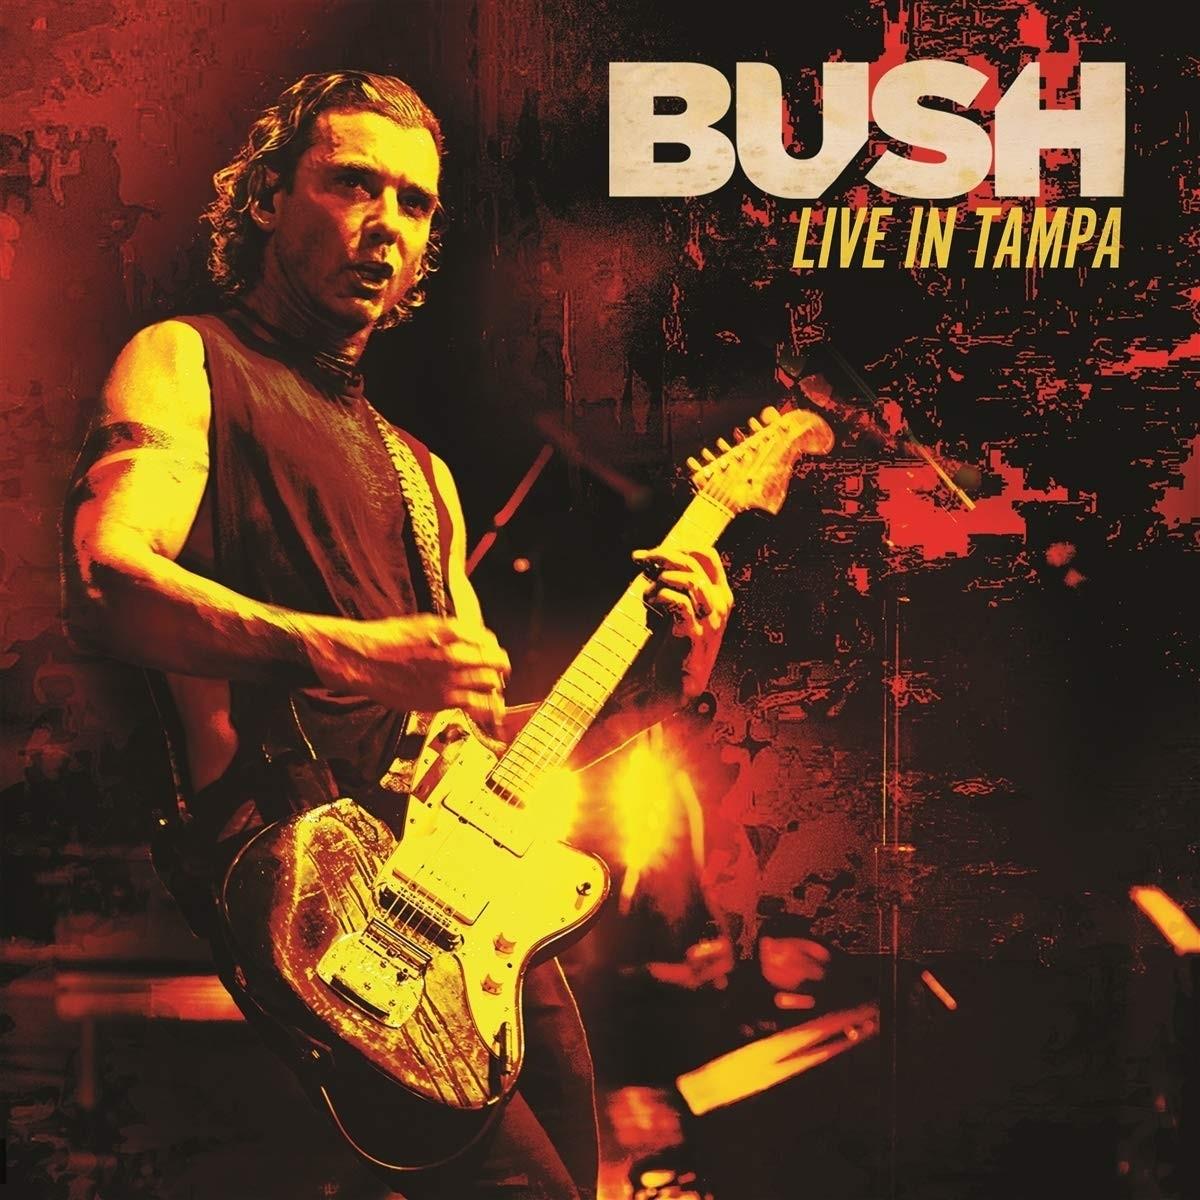 Bush - Live In Tampa (Red) 2XLP Vinyl